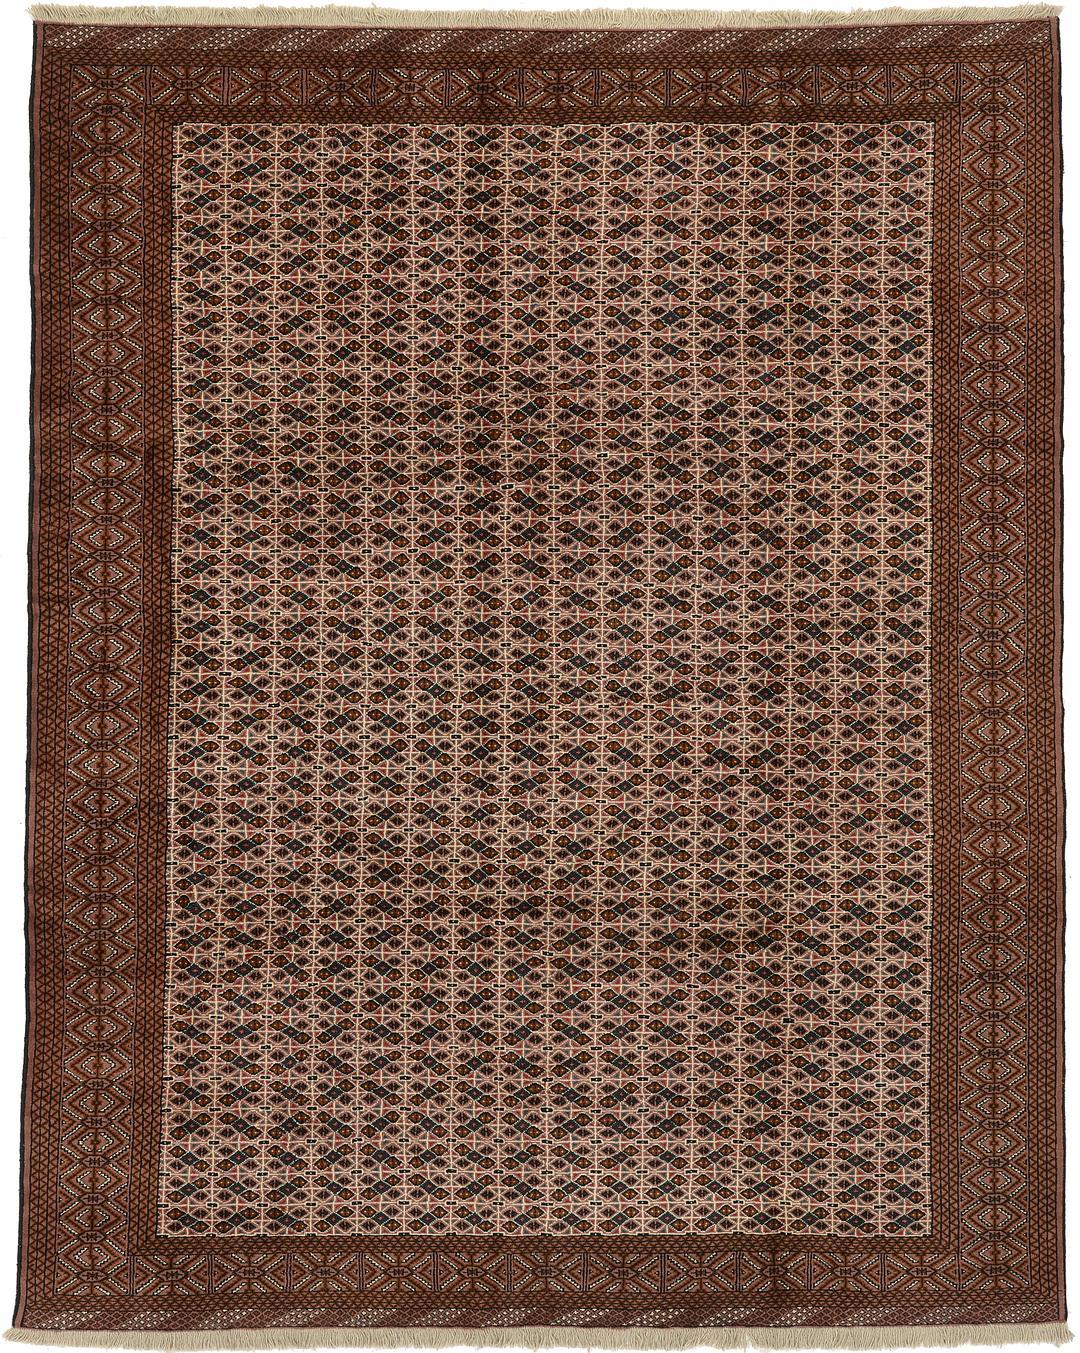 10 2 X 12 9 Bokhara Oriental Rug